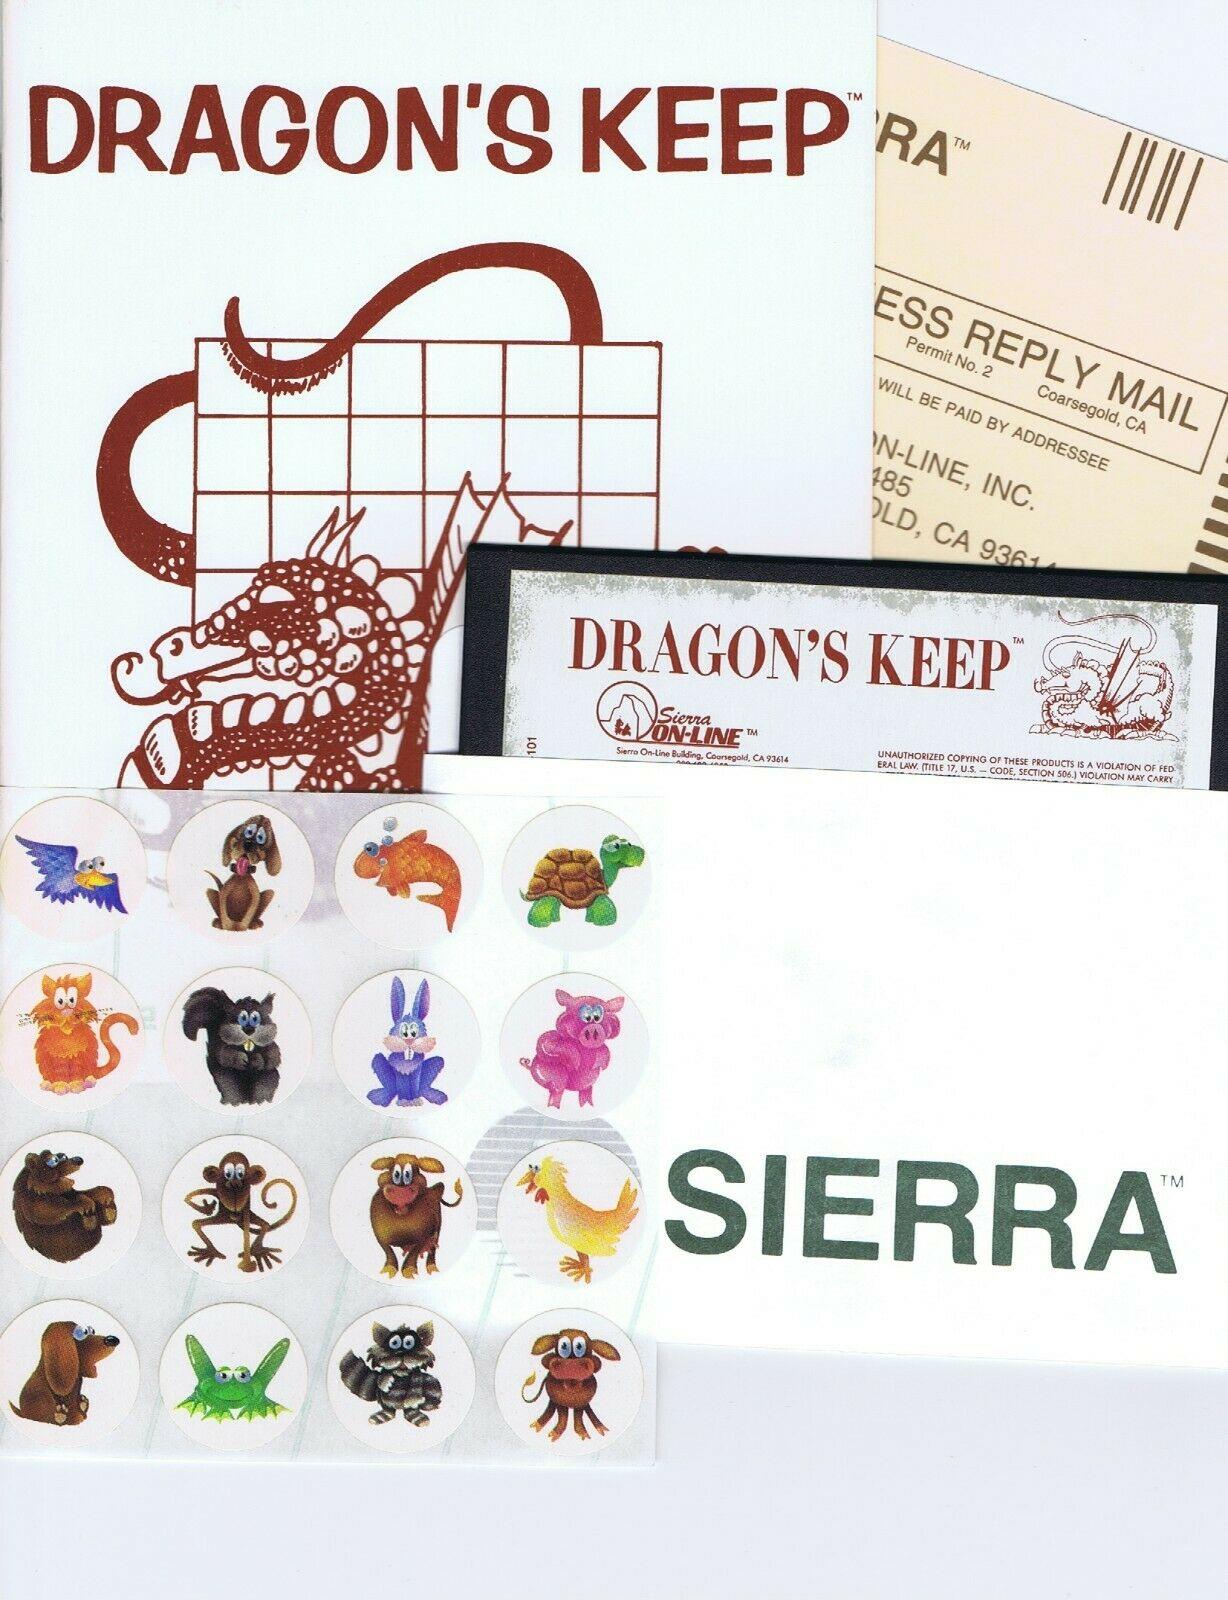 c64-dragon's-keep-sierra-04